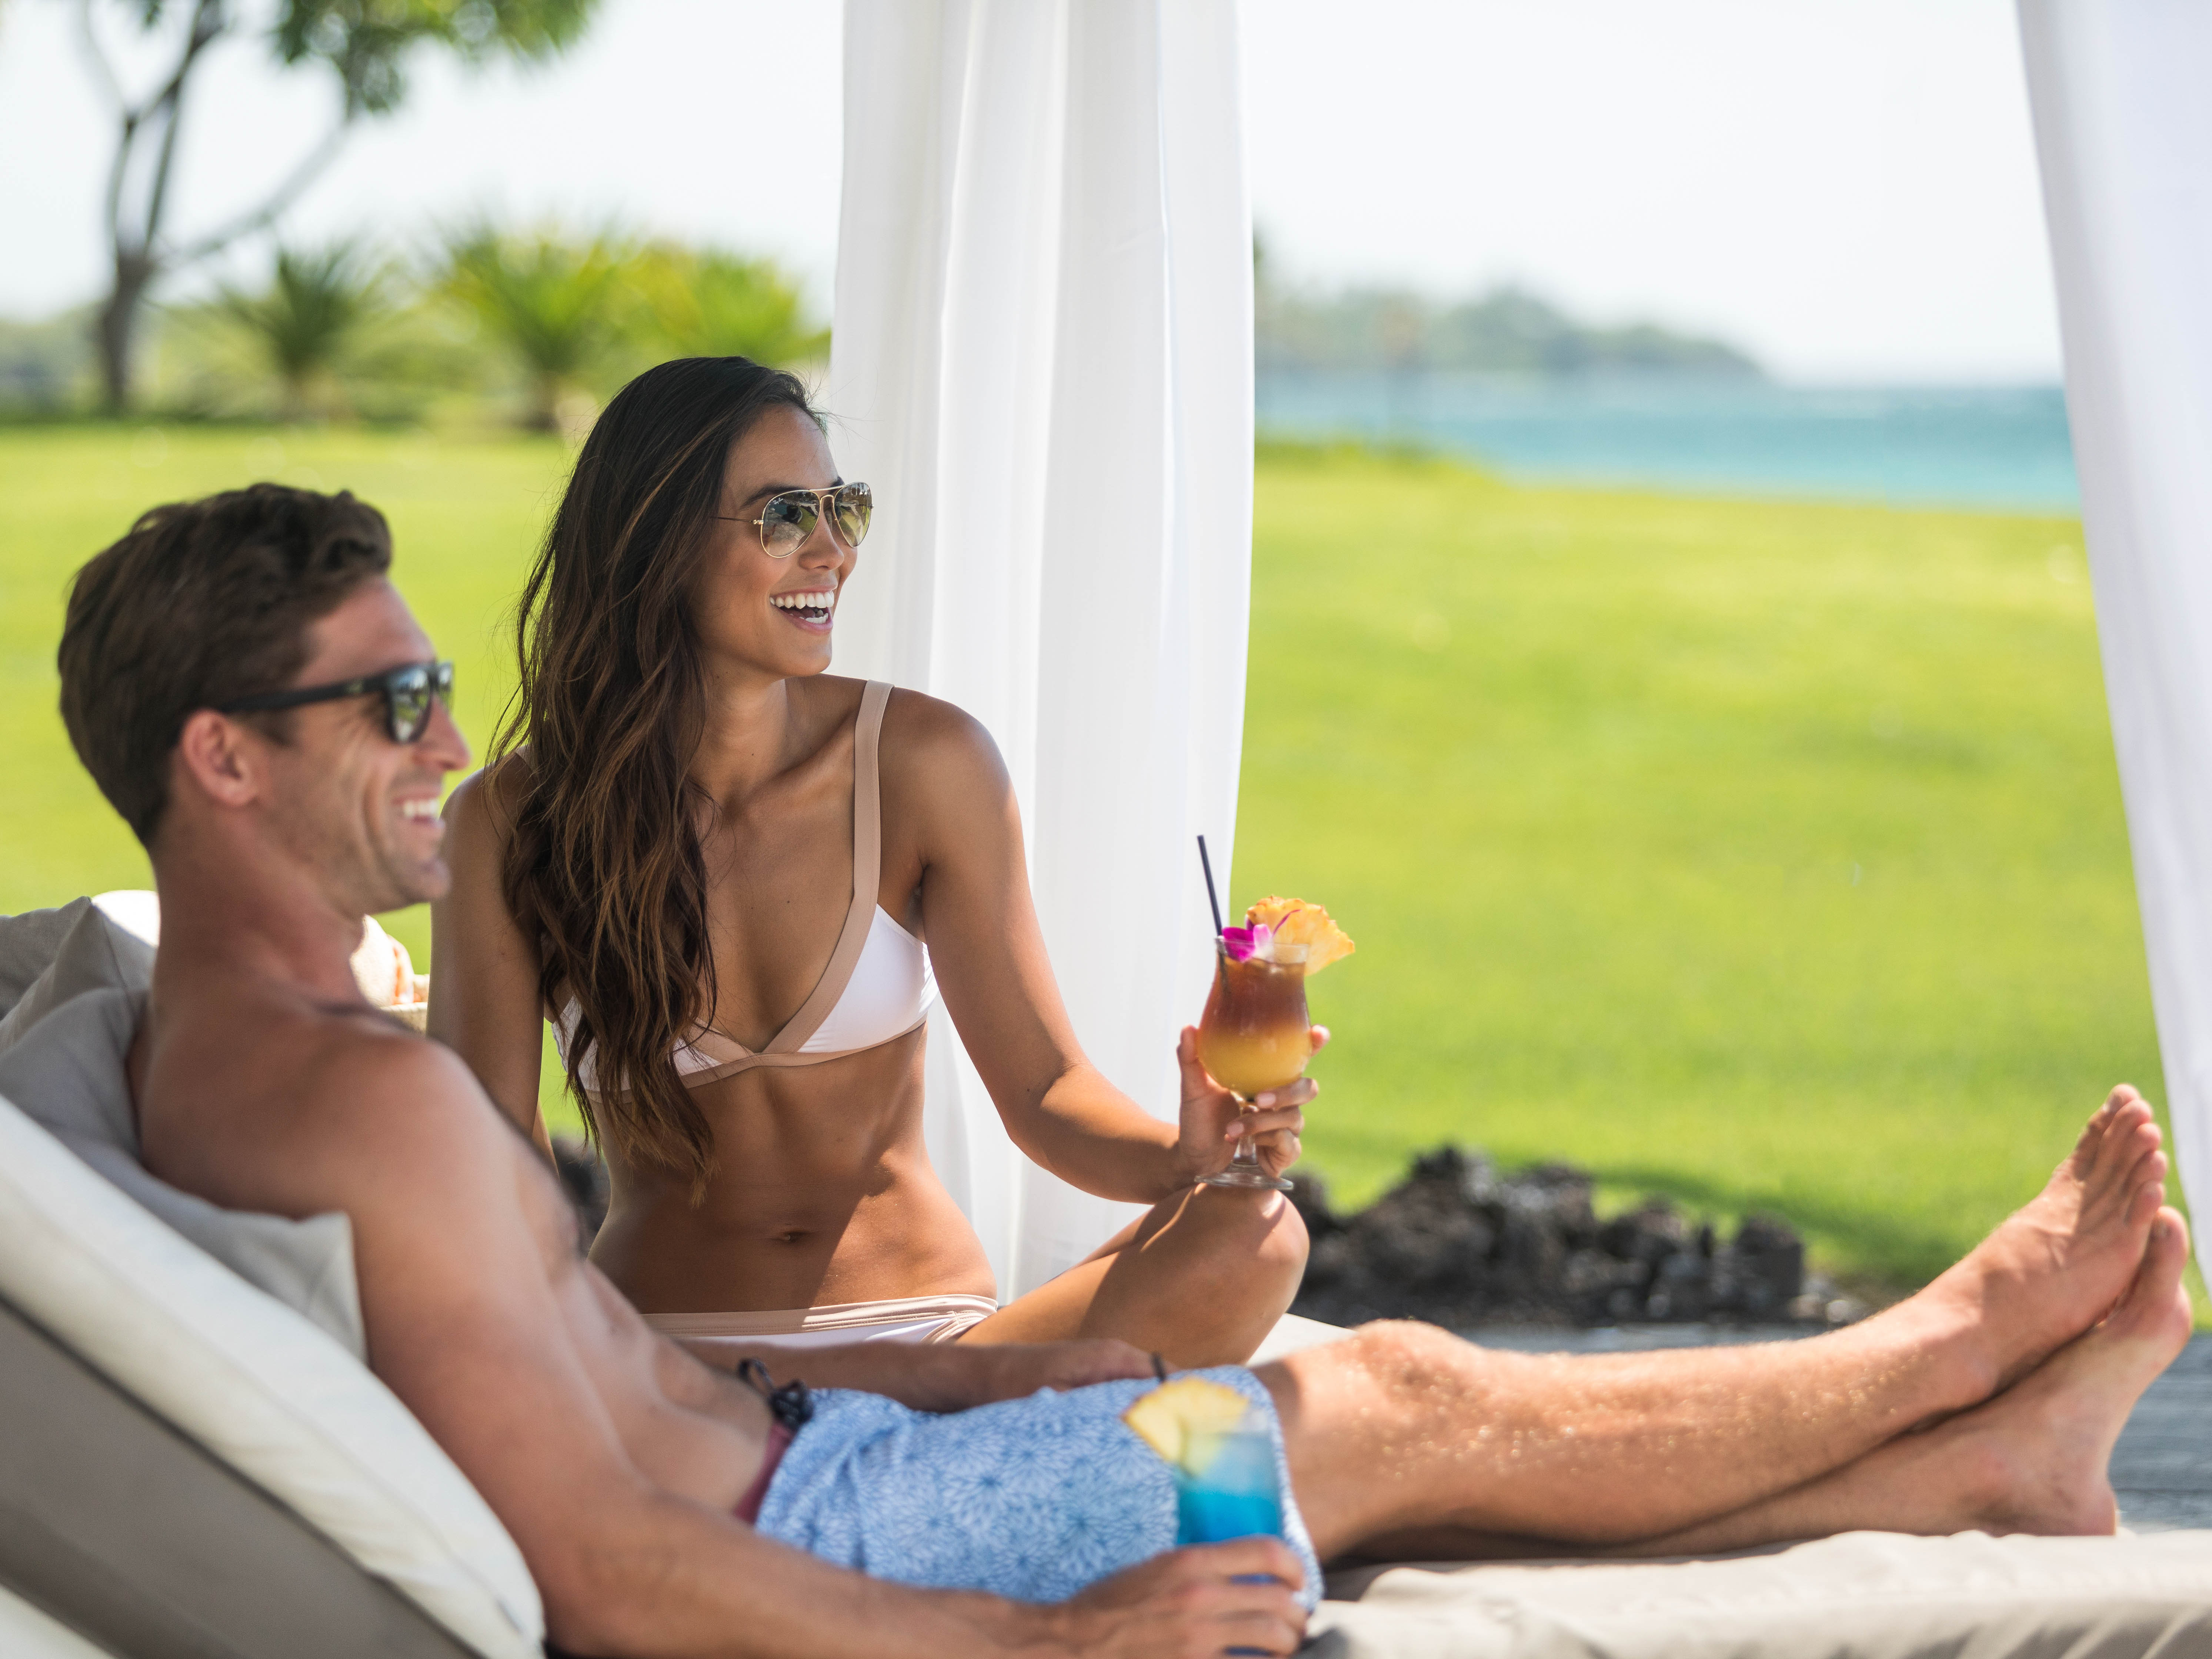 Marriott's Waikoloa Ocean Club Poolside Cabana. Marriott's Waikoloa Ocean Club is located in Waikoloa Beach, Big Island, Hawai'i United States.